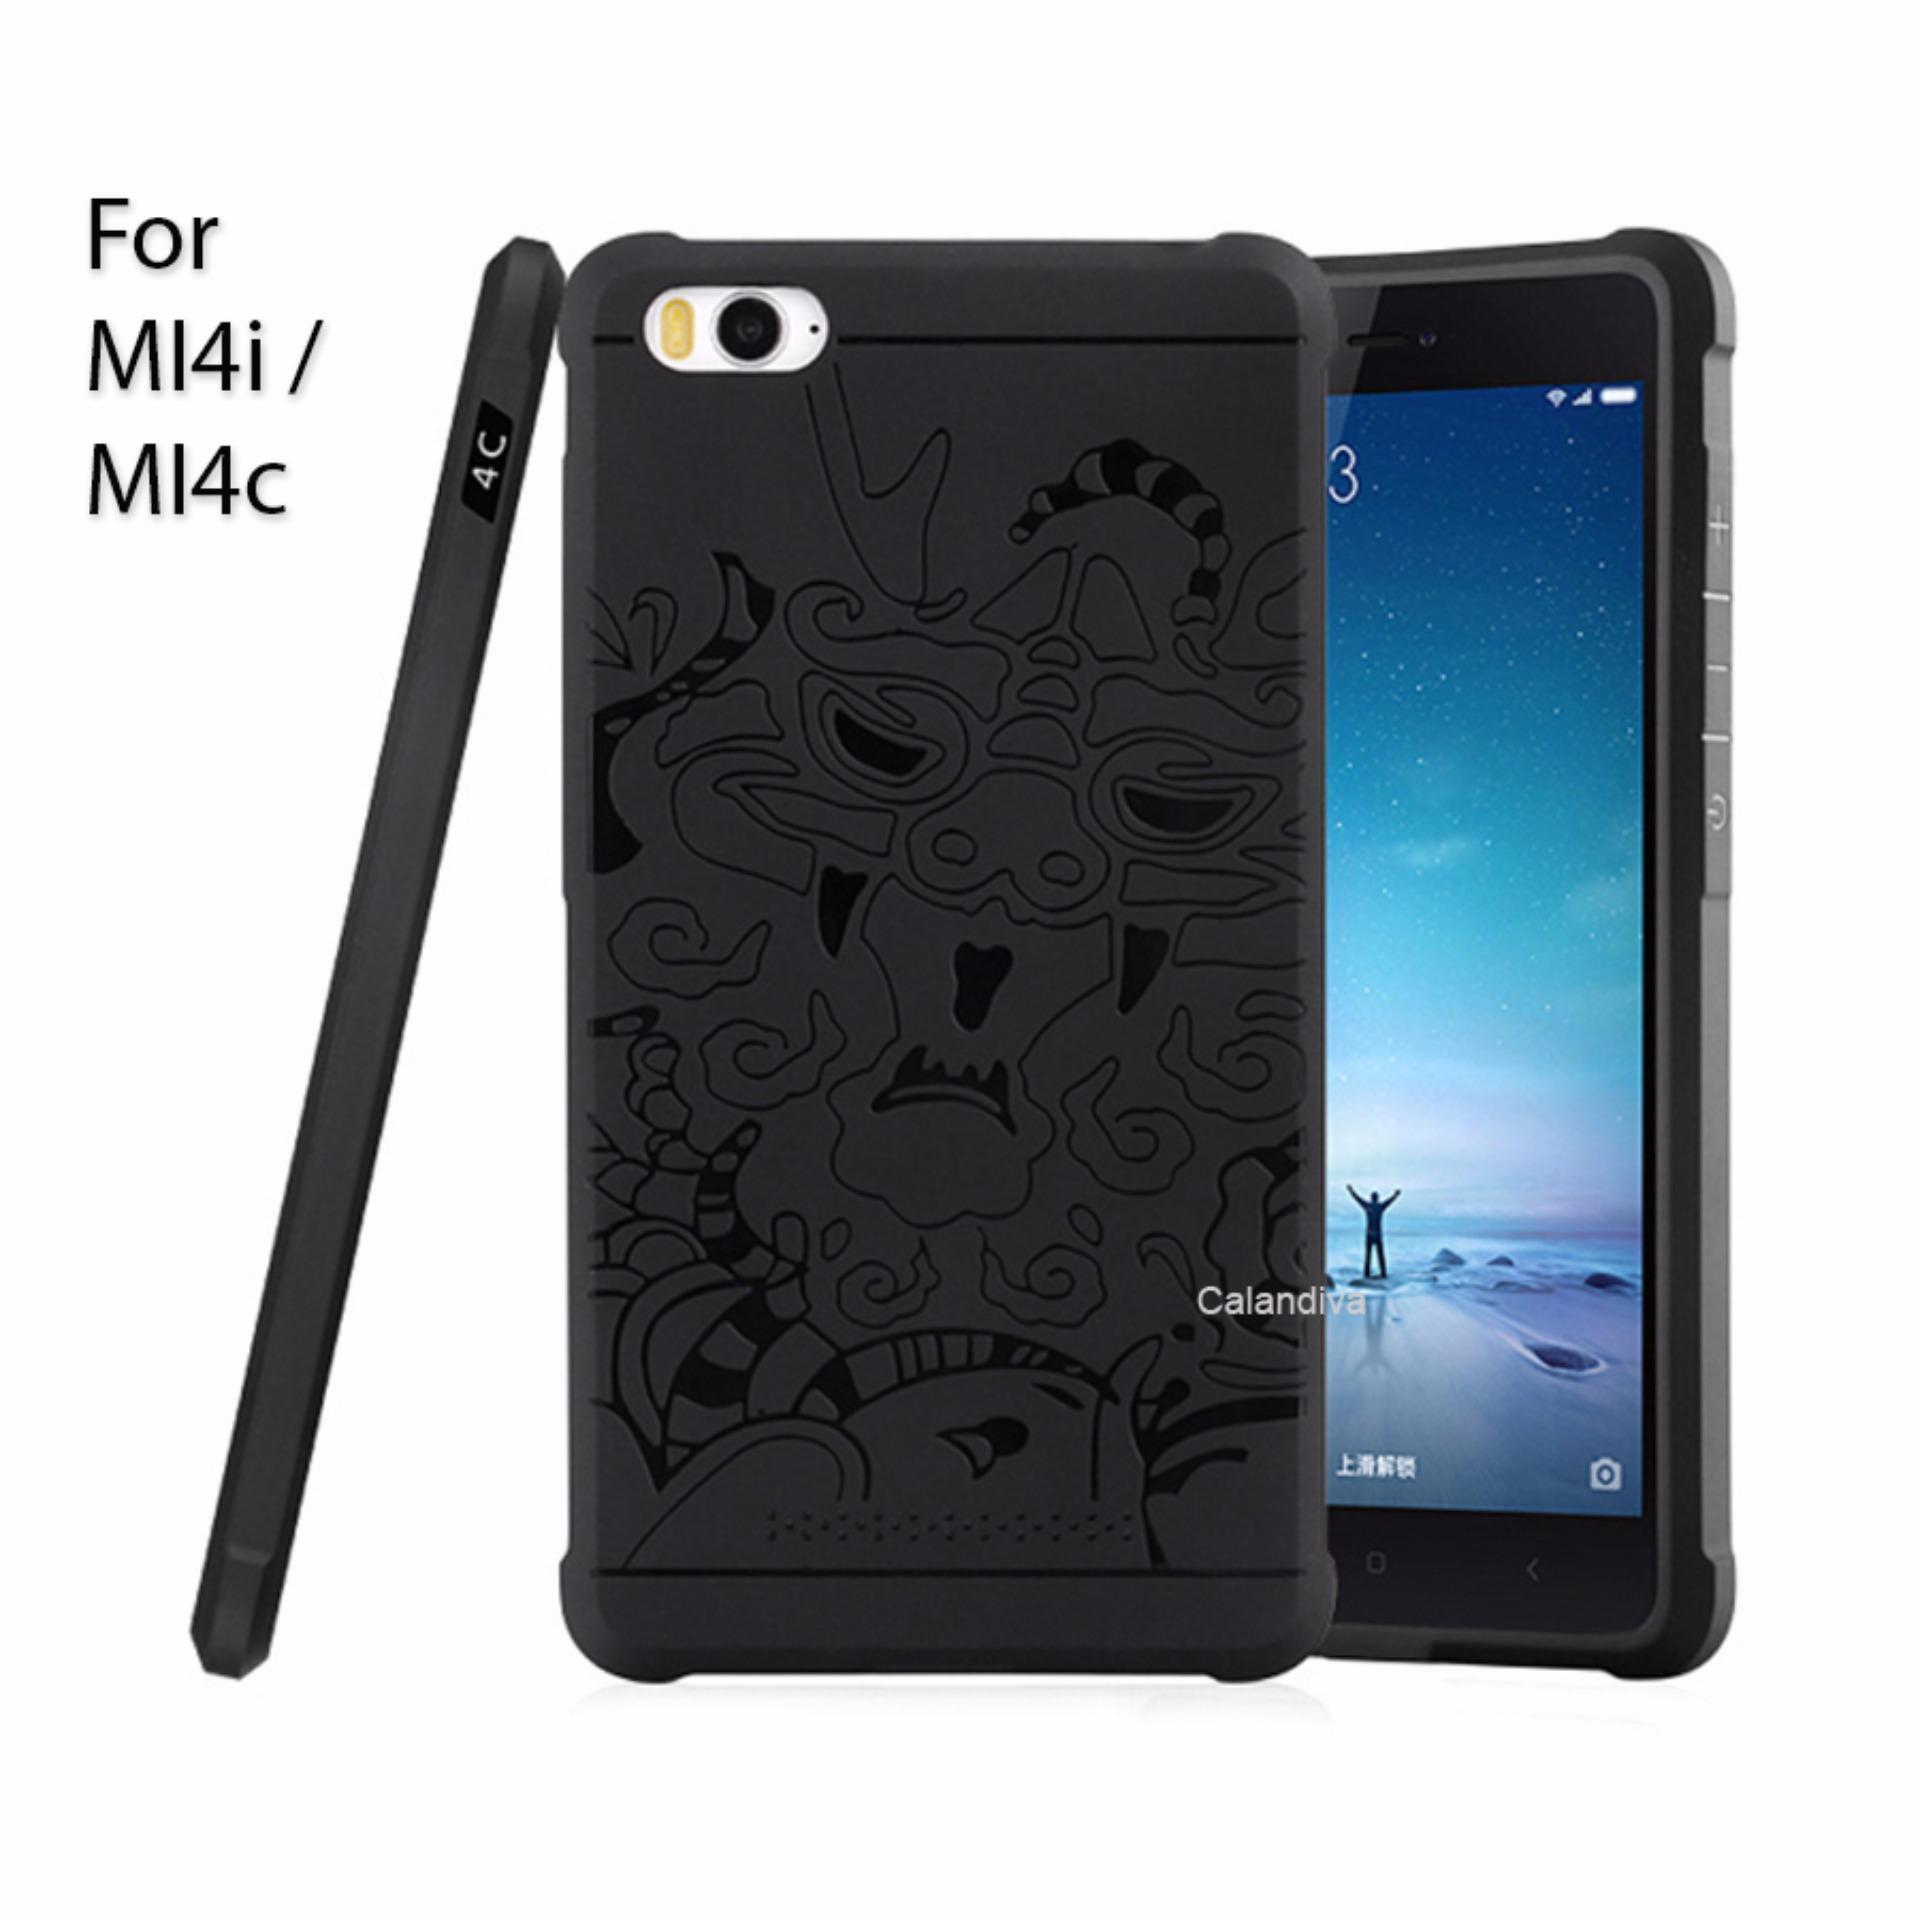 ... Calandiva Dragon Shockproof Hybrid Case for Xiaomi MI4i / MI4c - Hitam ...